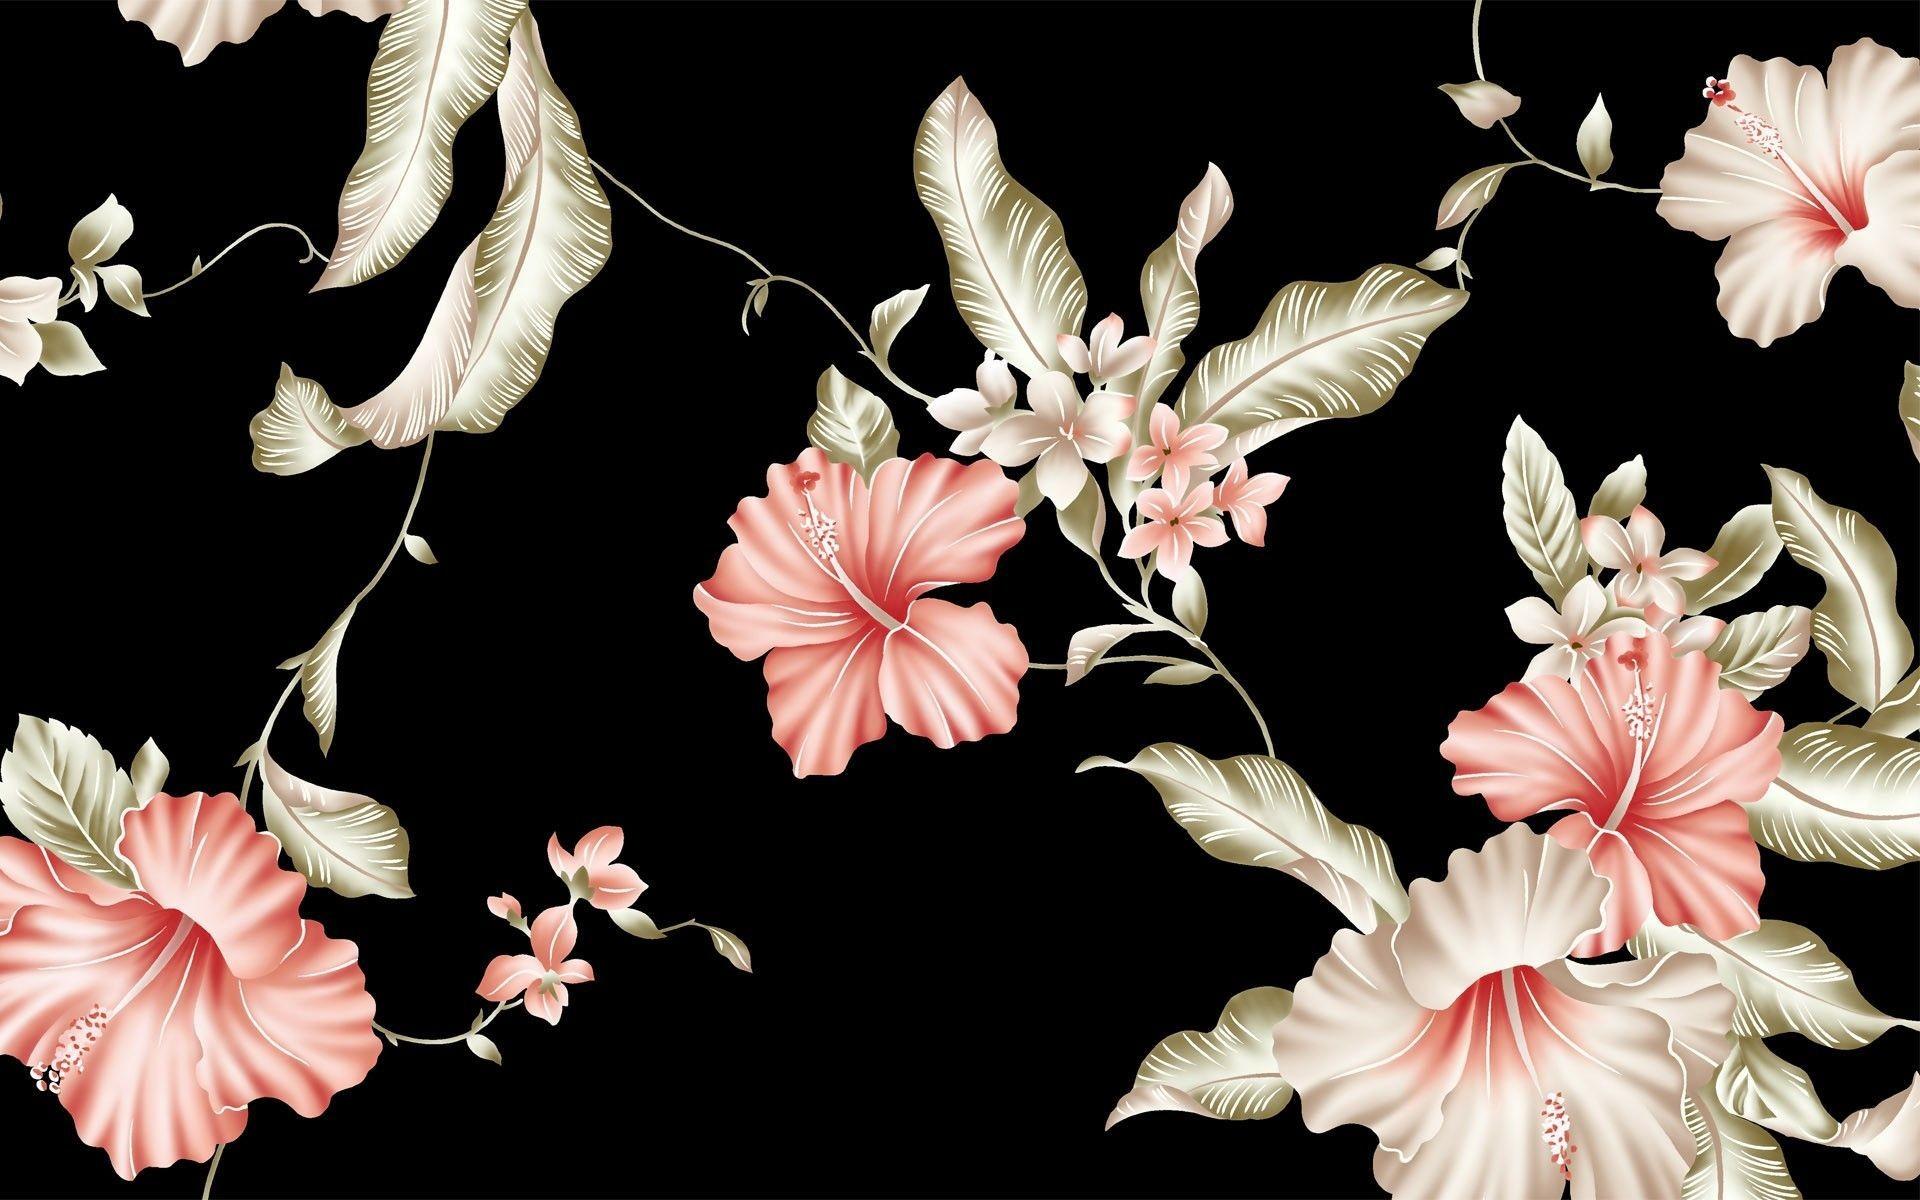 Free Download Vintage Flower Backgrounds HD 1920x1200